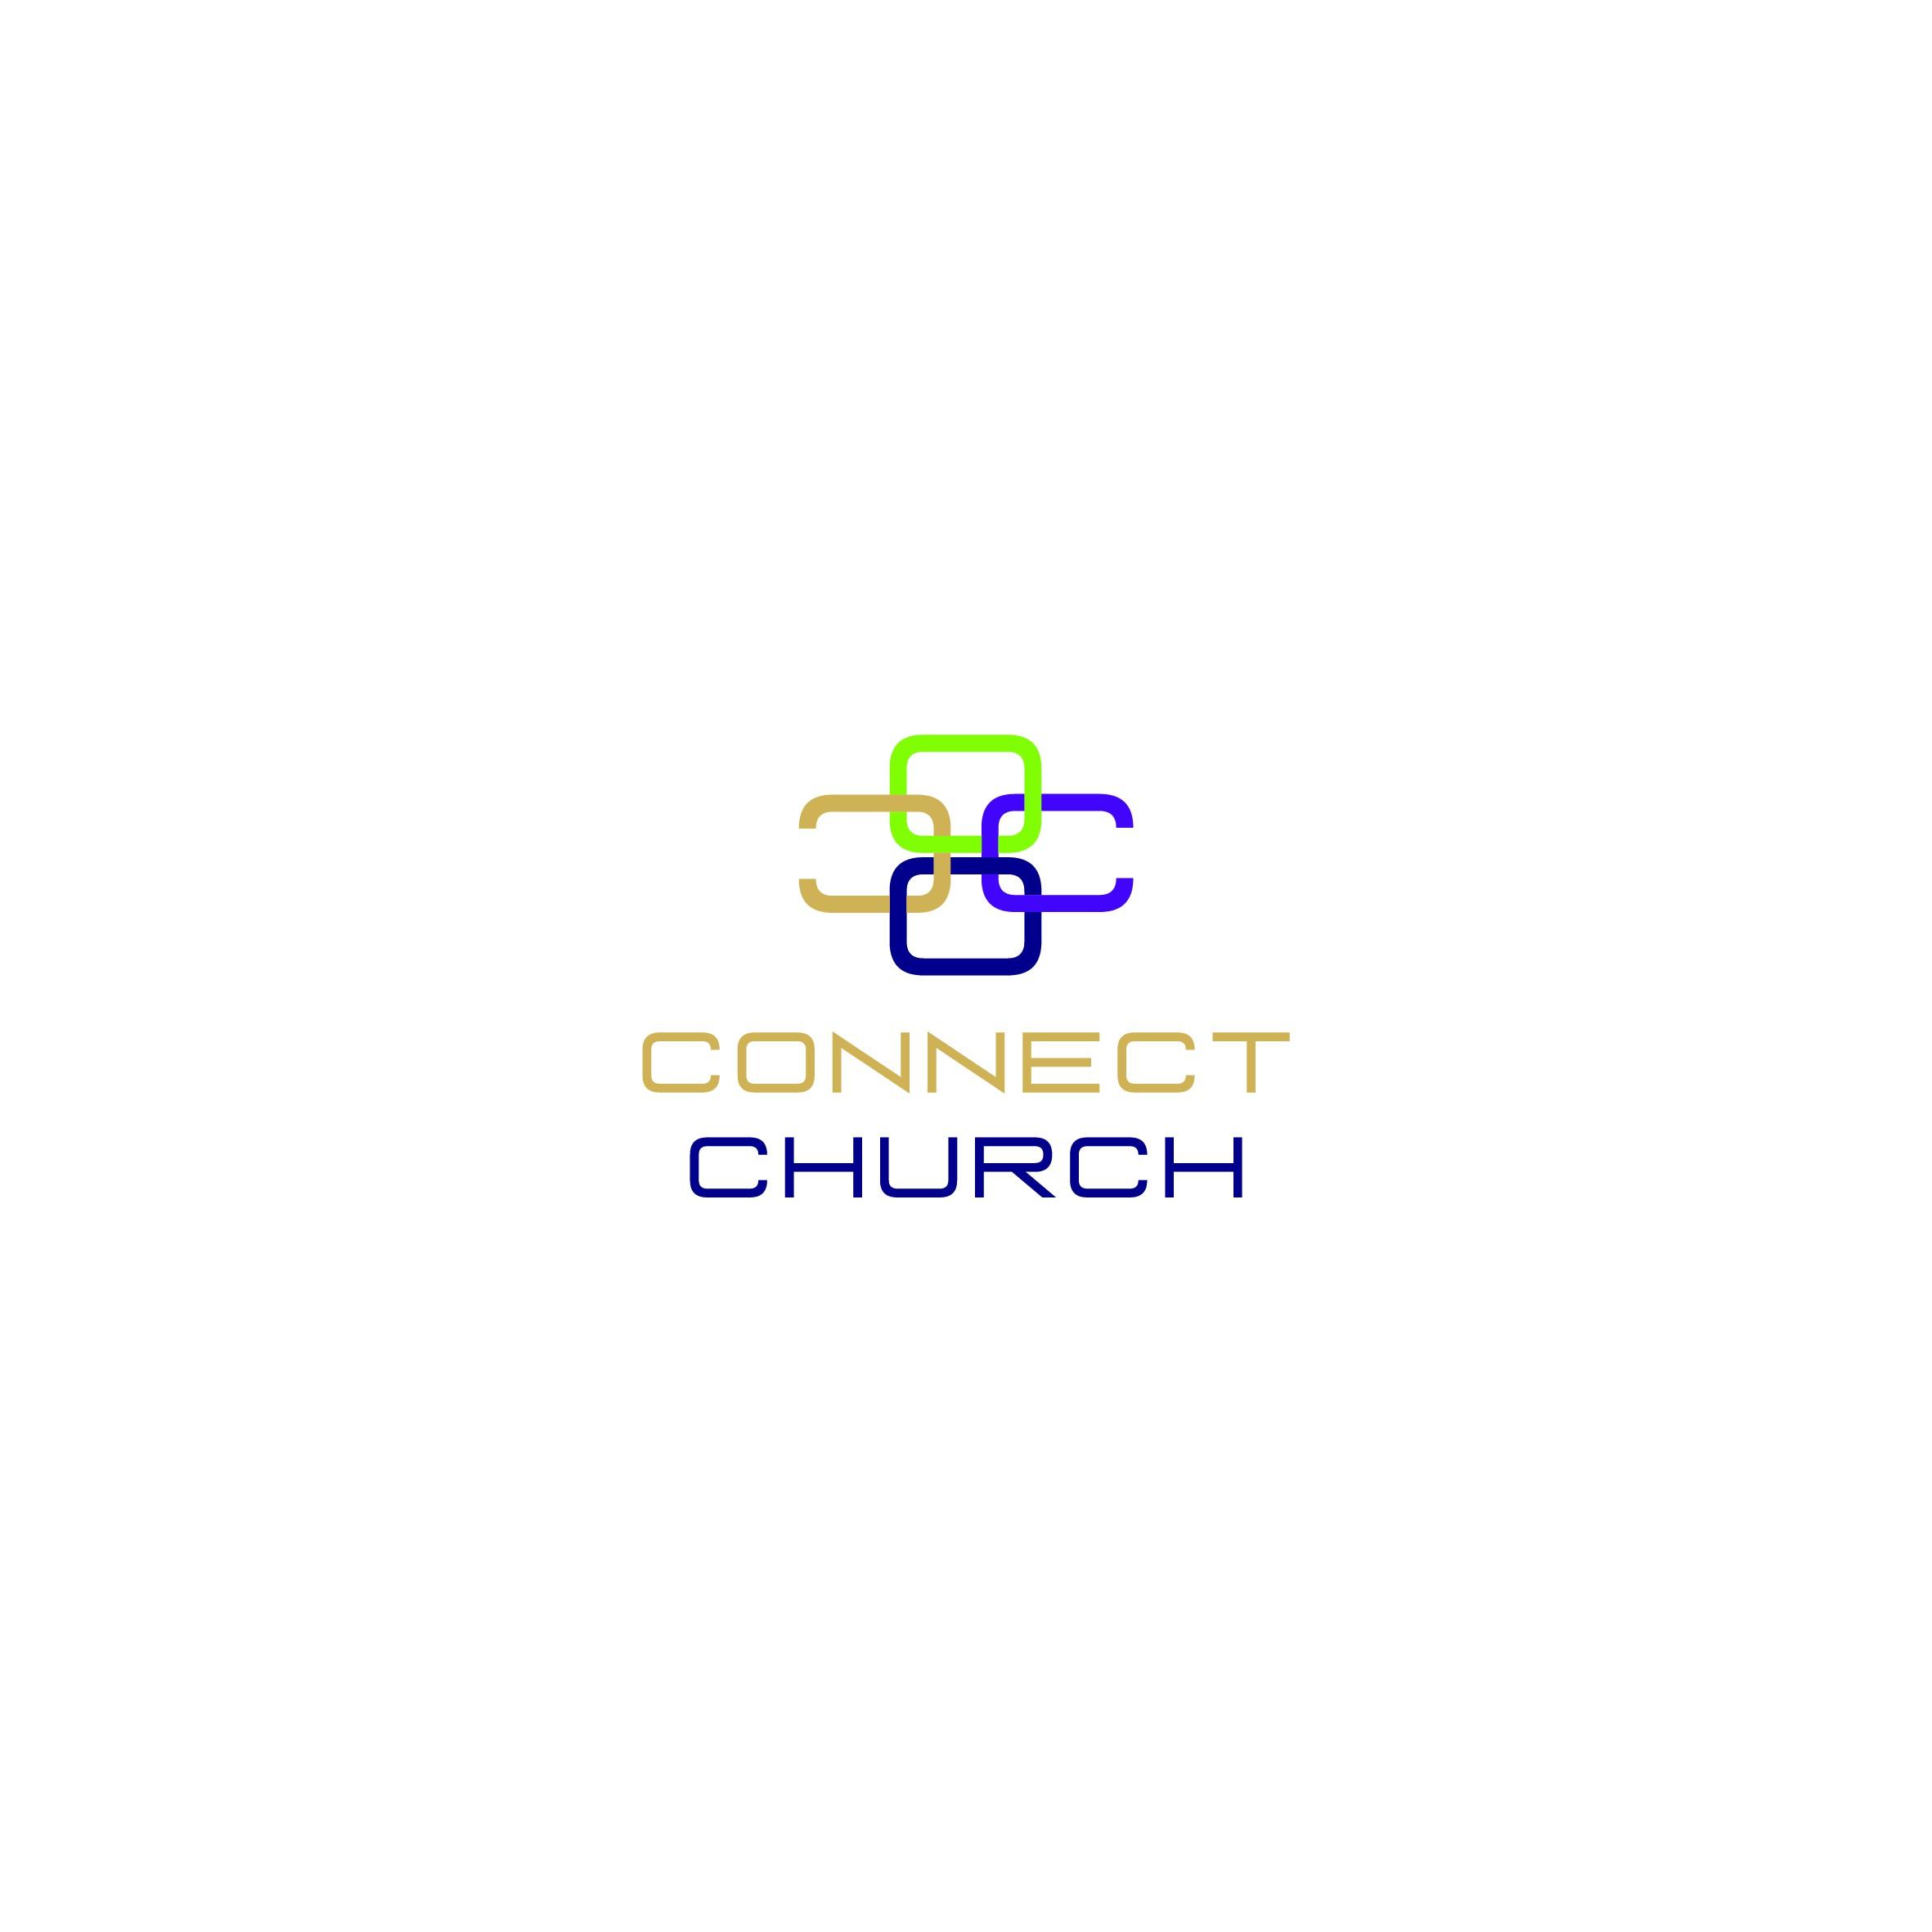 Creative Connect Church Designer Challenge